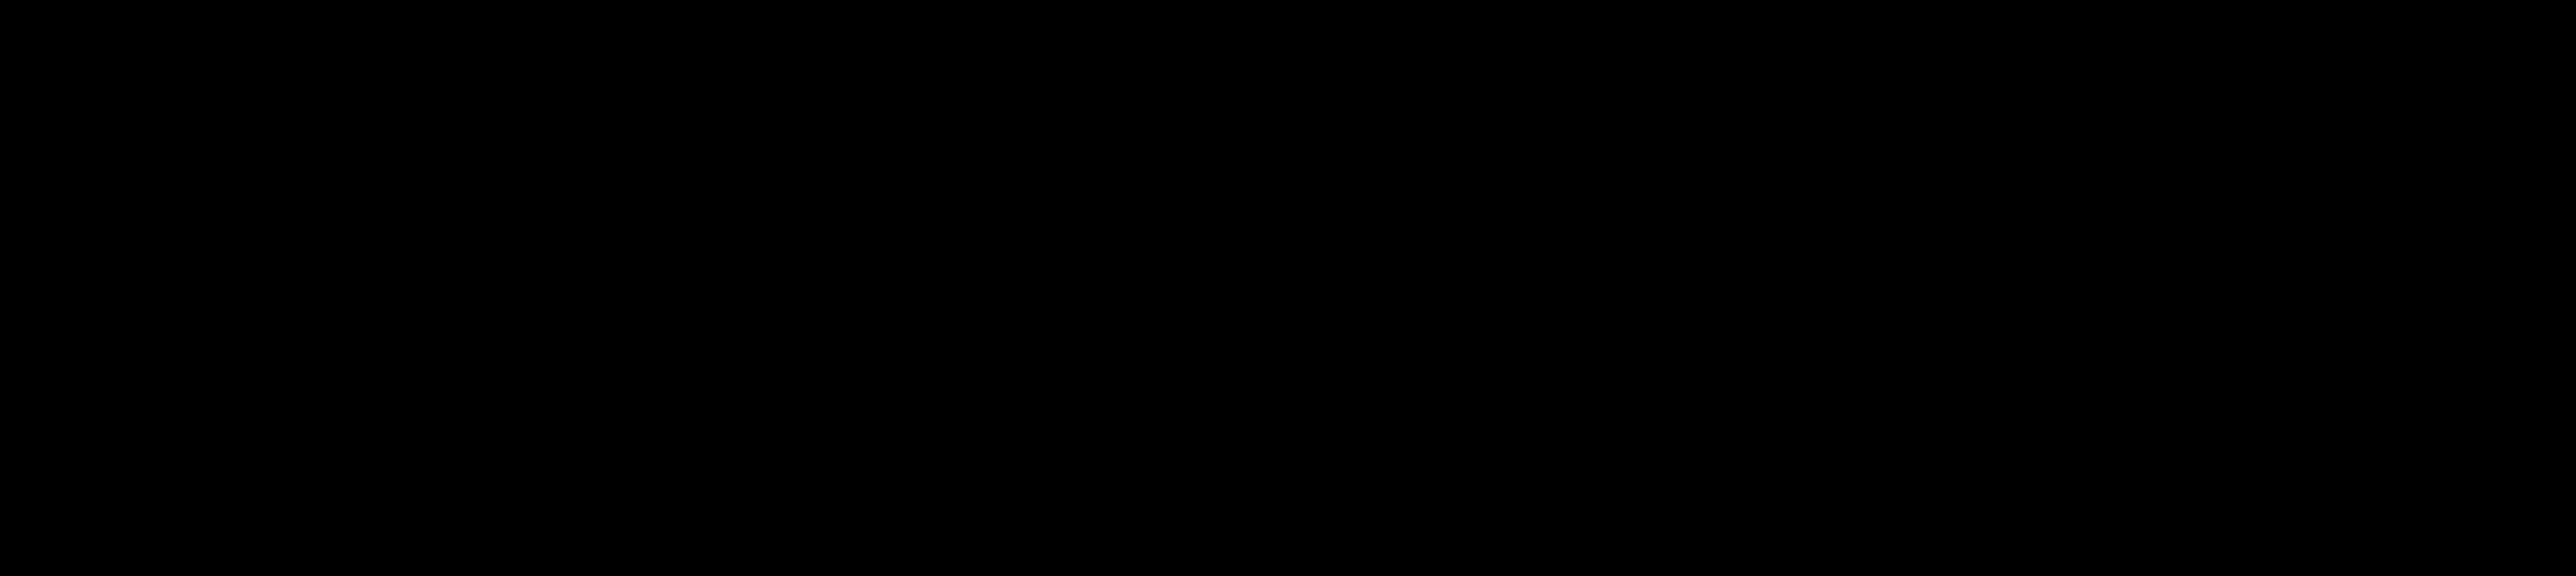 JWE Complete Brachypodosaurus line drawing.png